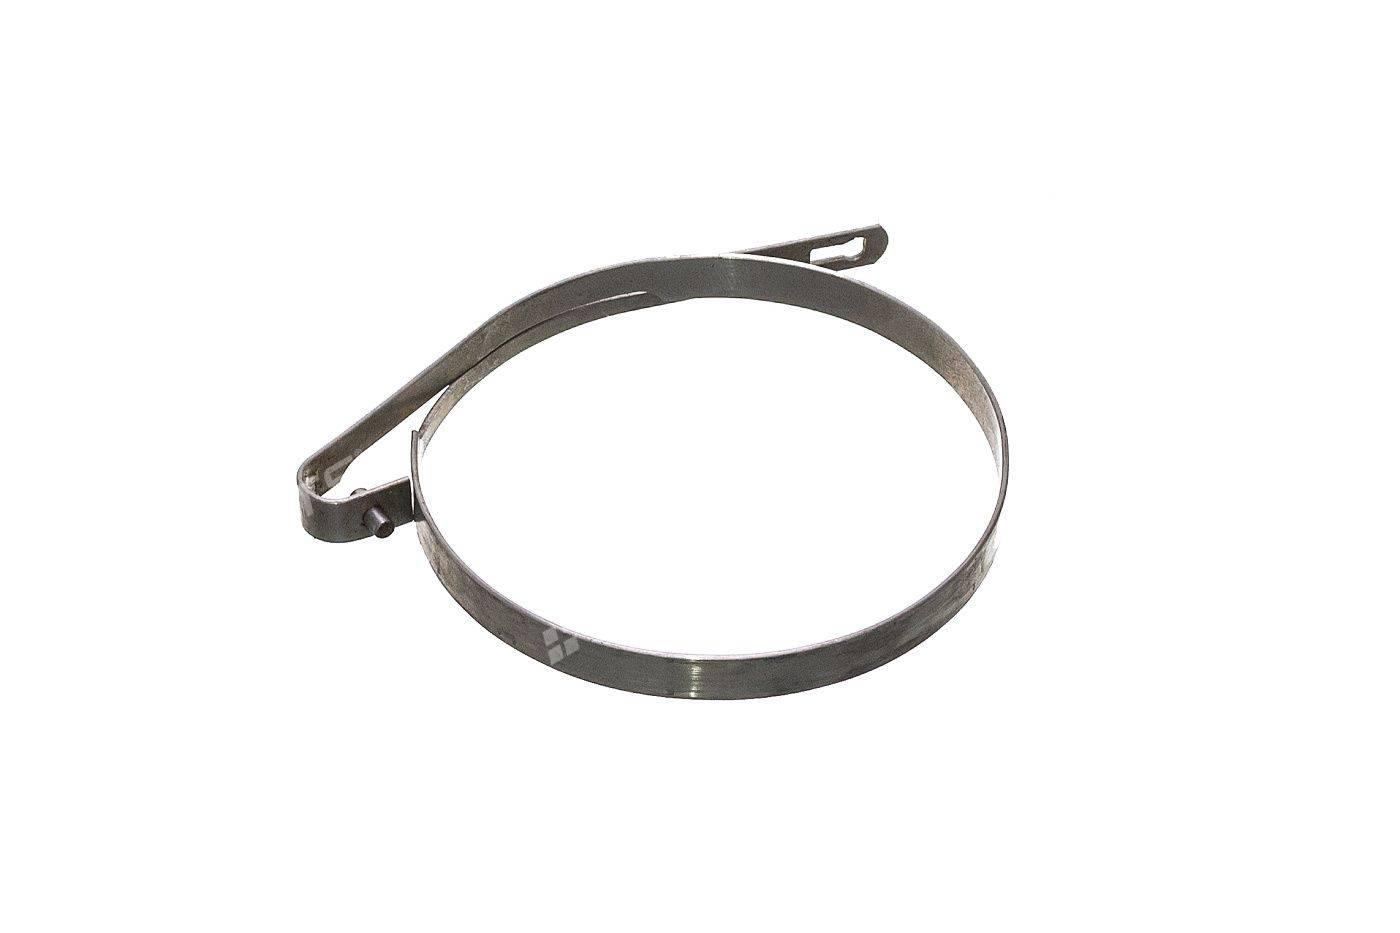 Bremsband Stihl MS260 MS240 026 024 009 010 011 012 - 1121 160 5400